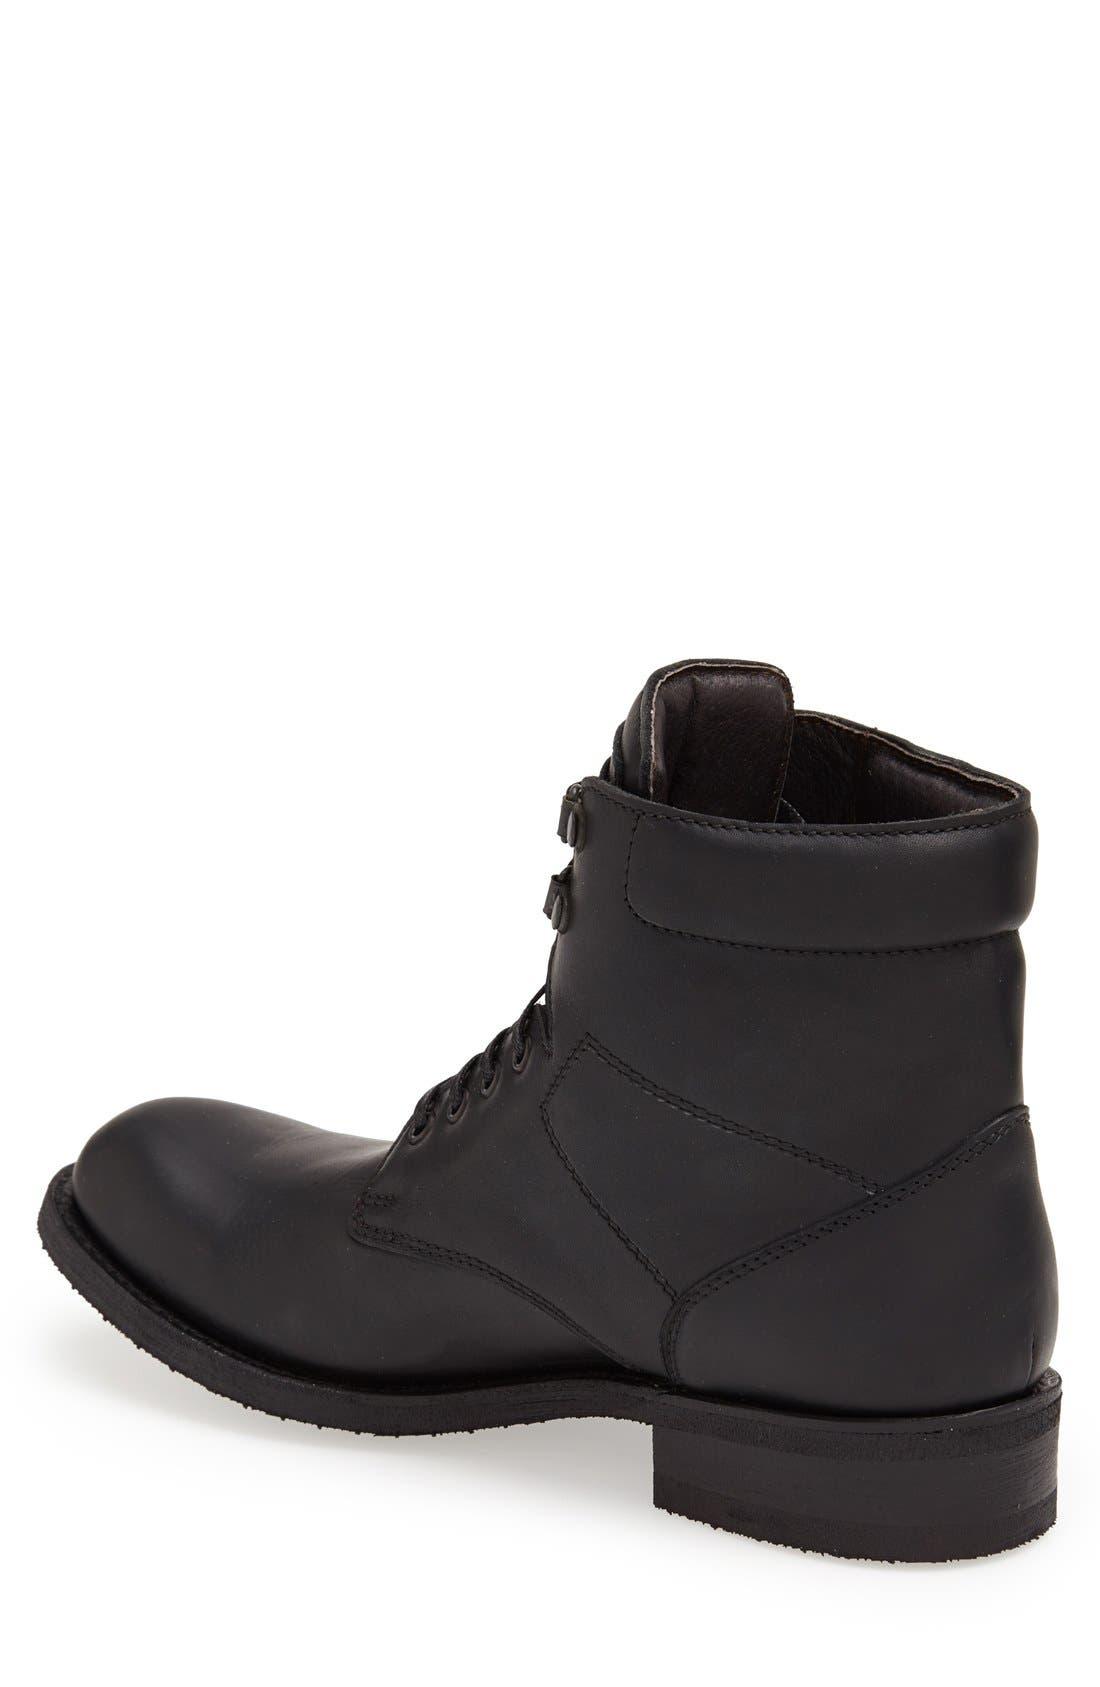 Alternate Image 2  - Sendra 'Traveler' Round Toe Boot (Men)